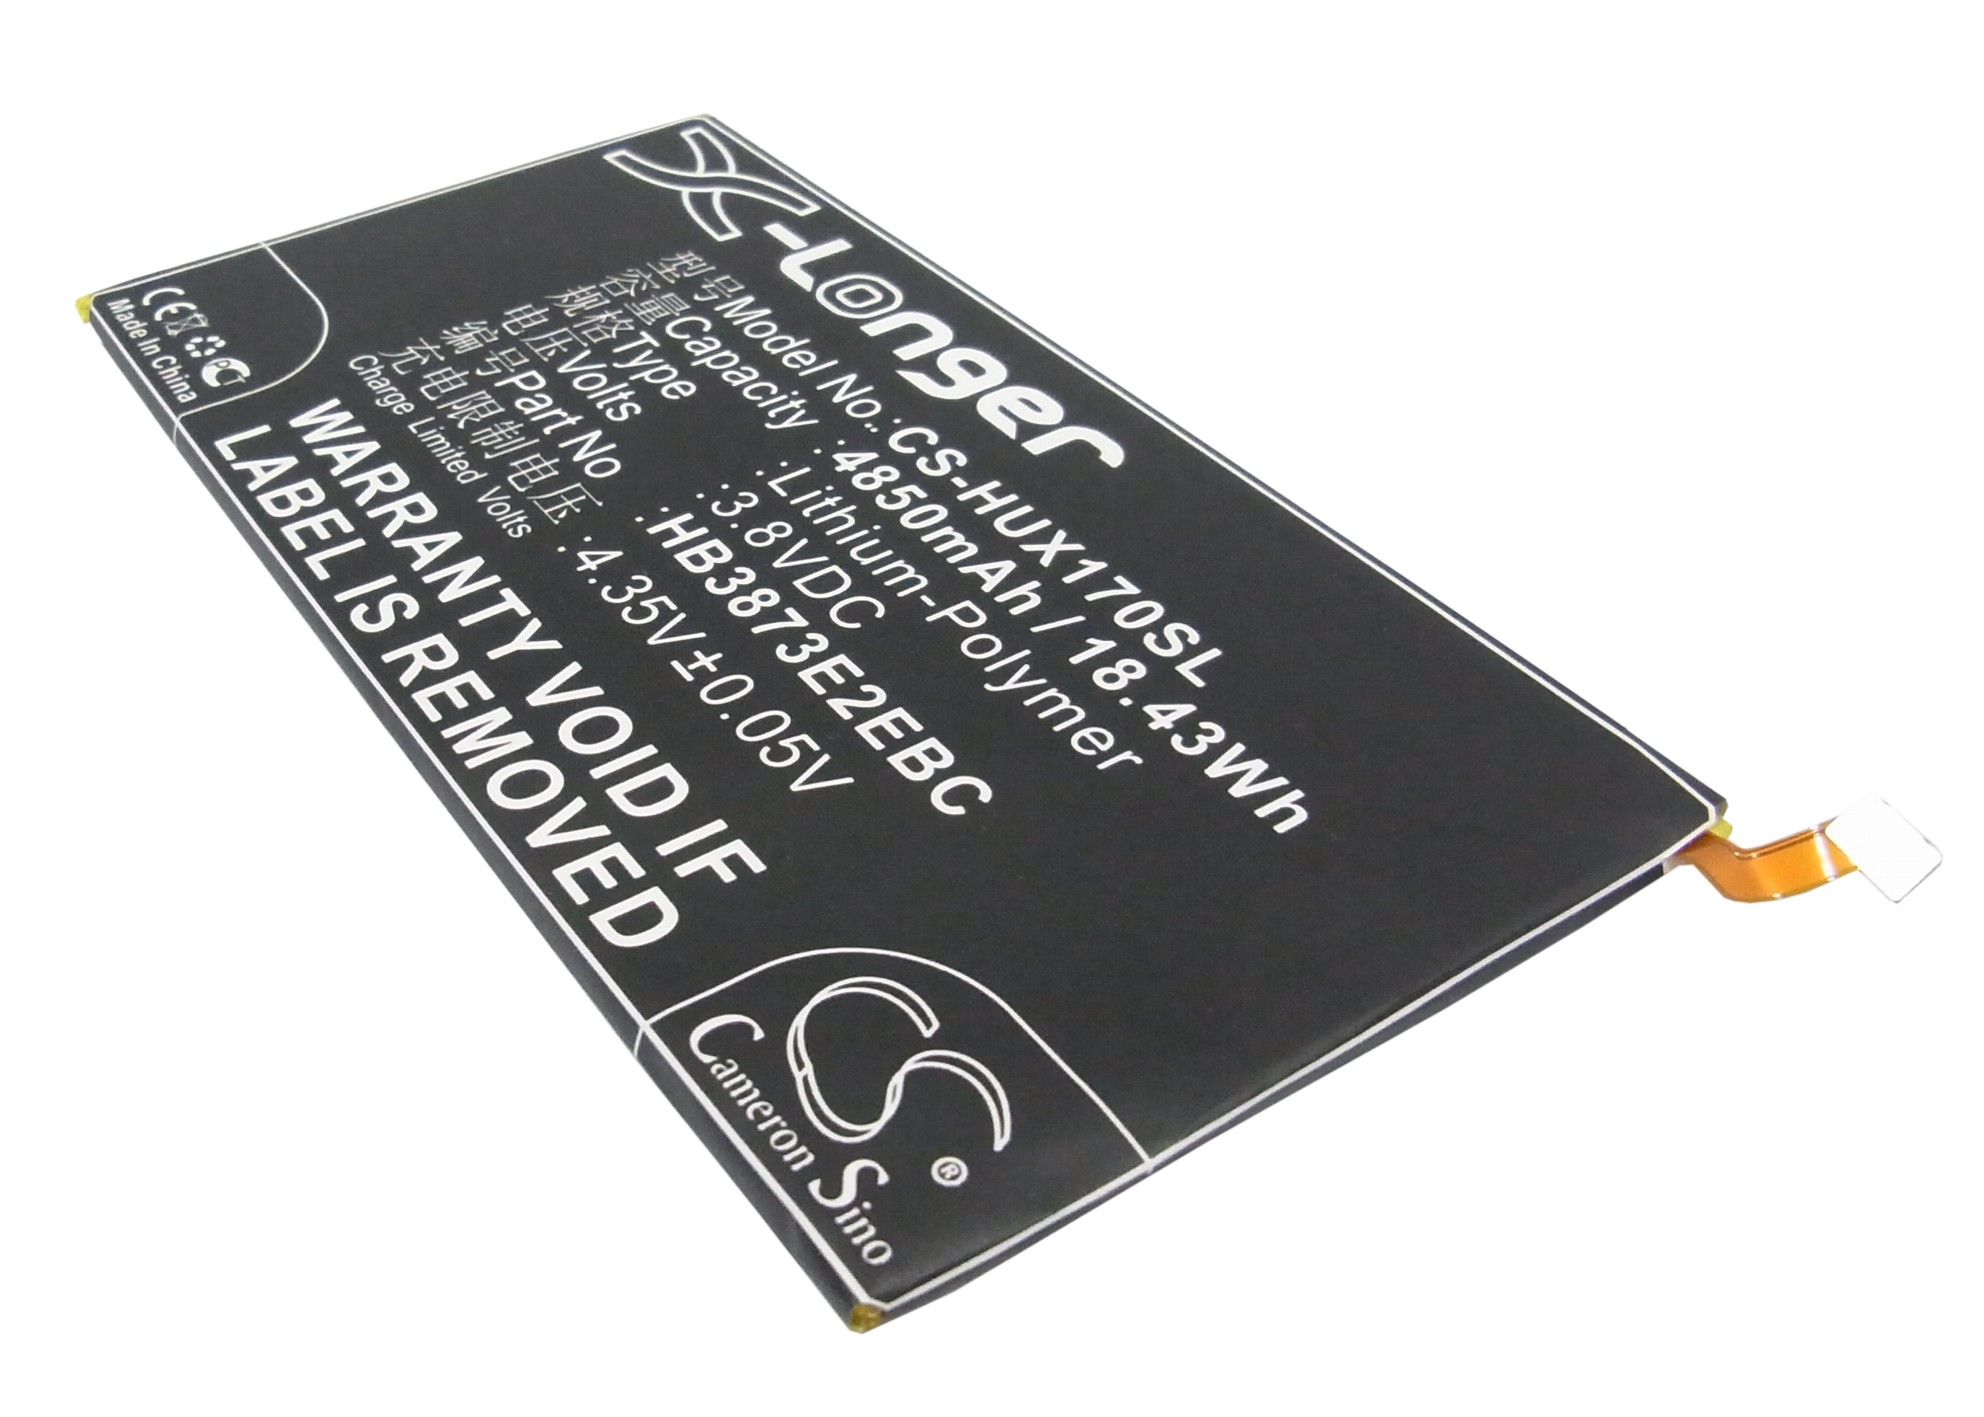 Cameron Sino baterie do tabletů pro HUAWEI Mediapad X1 7.0 3G 3.8V Li-Polymer 4850mAh černá - neoriginální